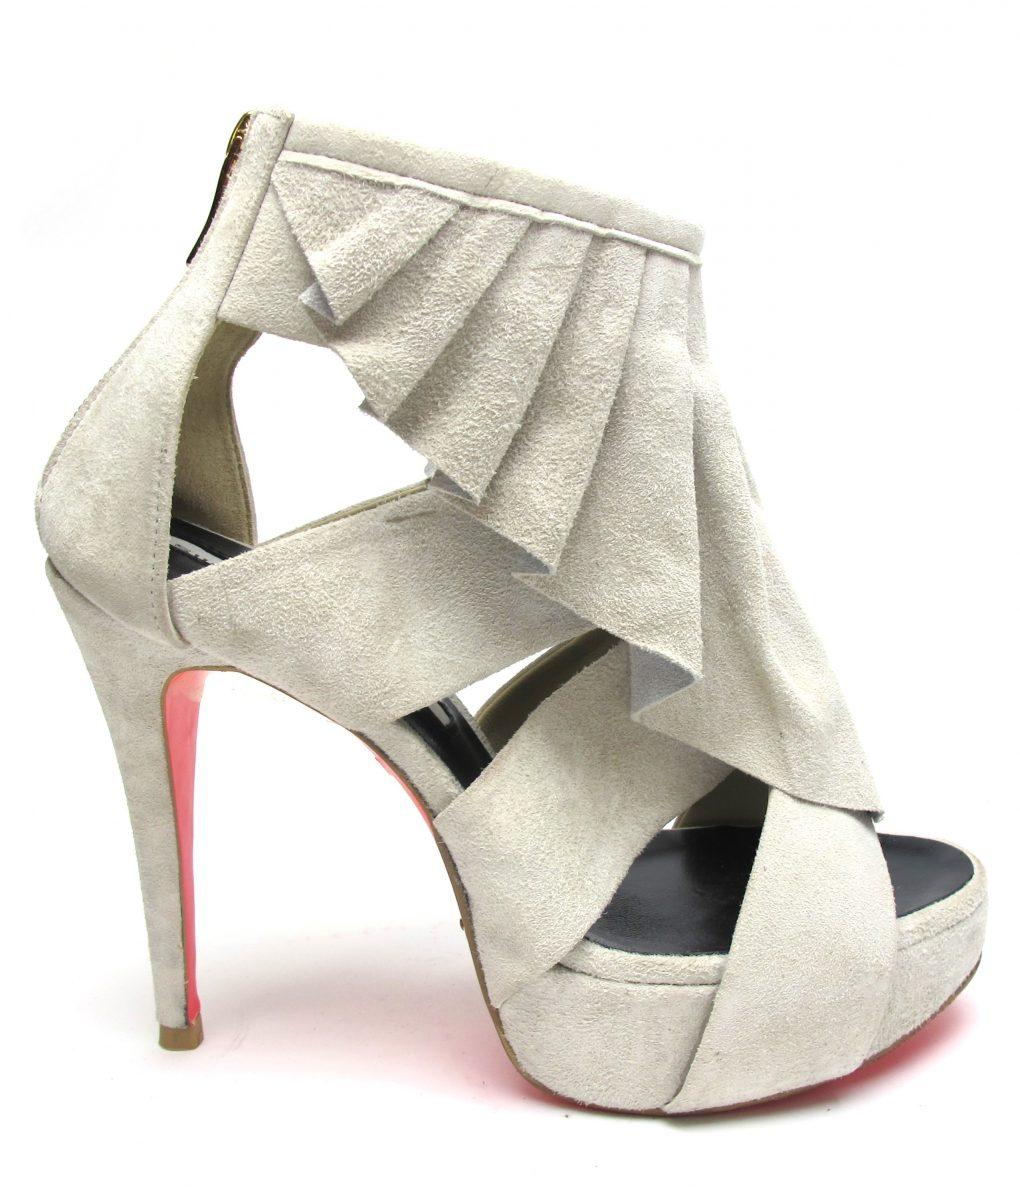 Suecomma Bonnie Ecru Suede Ruffle heels